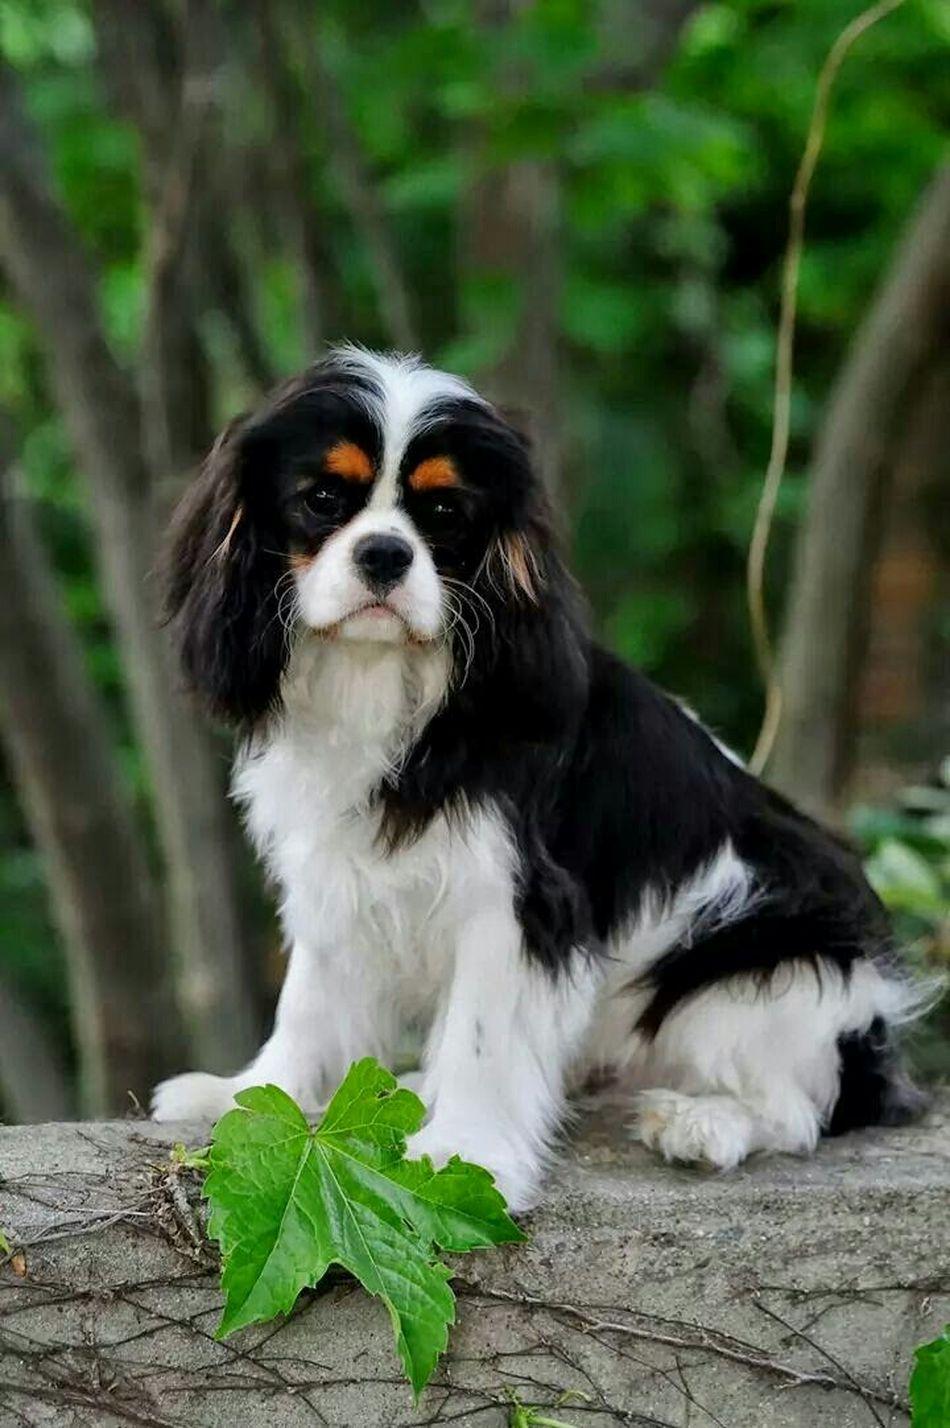 Spring Cavalier Cavalier King Charles Spaniel Puppy Cavalier Cavalier King Charles Ckcs Dog